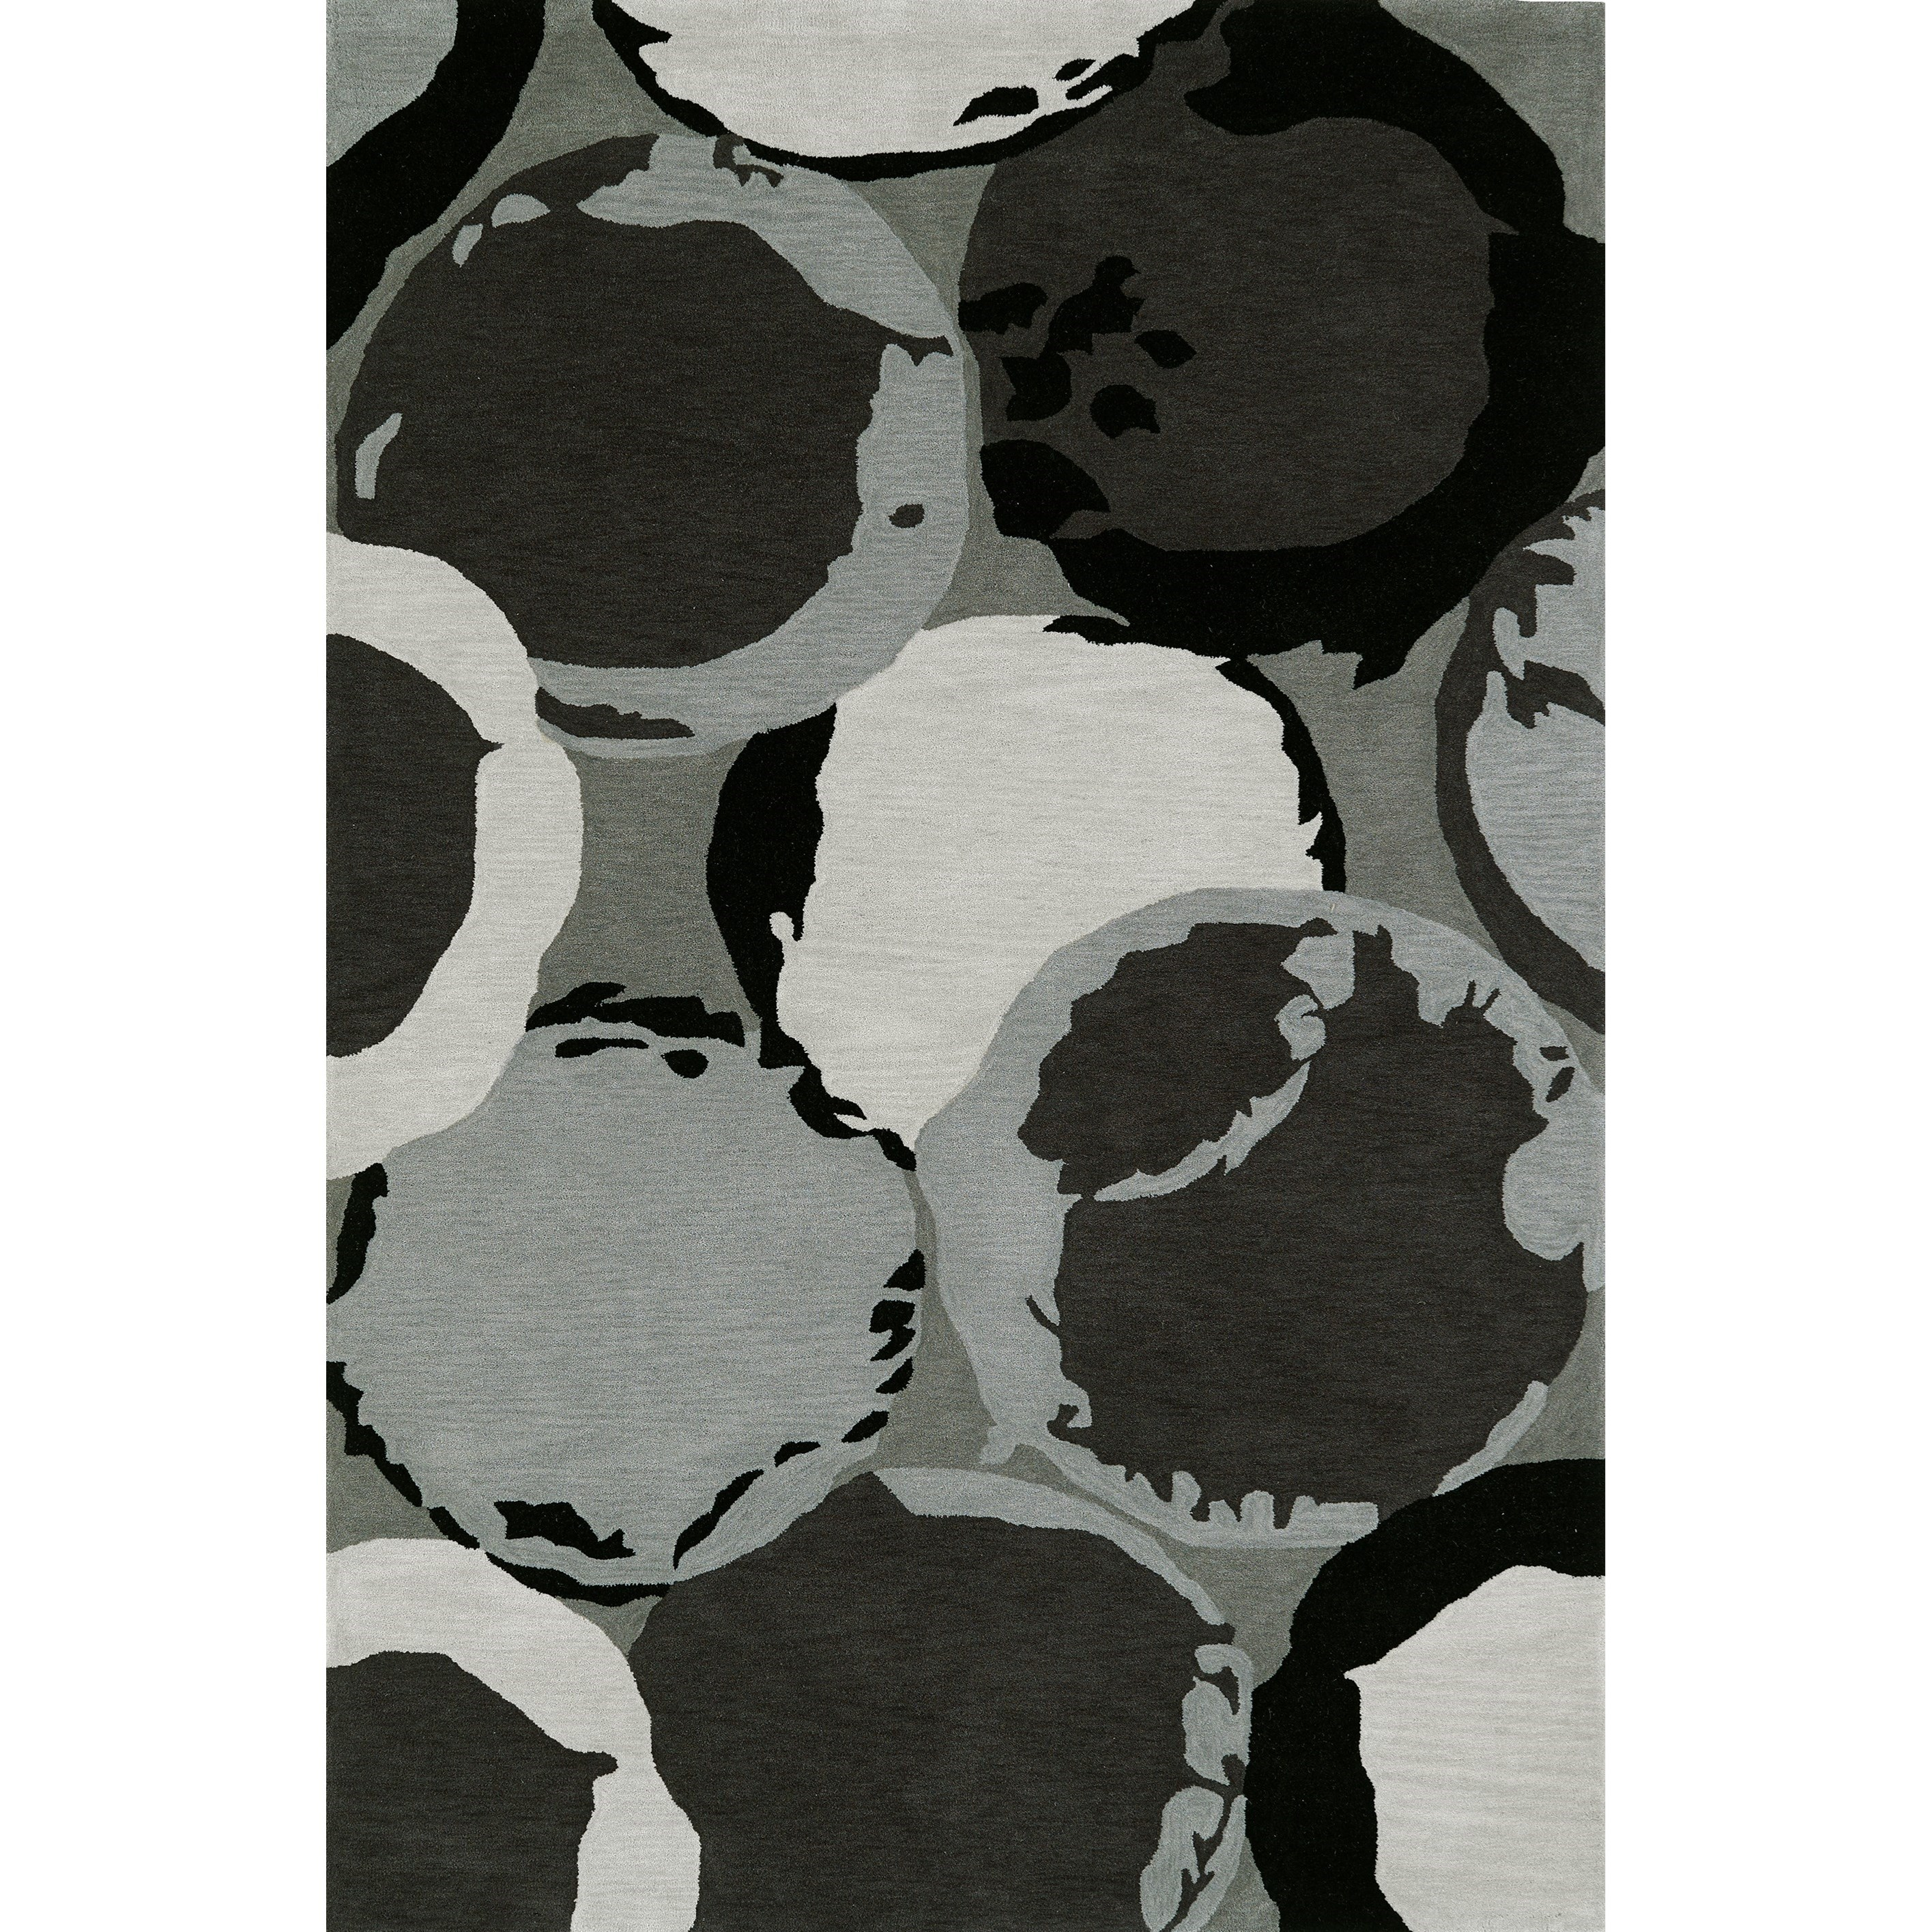 Aloft Grey 9'X13' Rug by Dalyn at Sadler's Home Furnishings